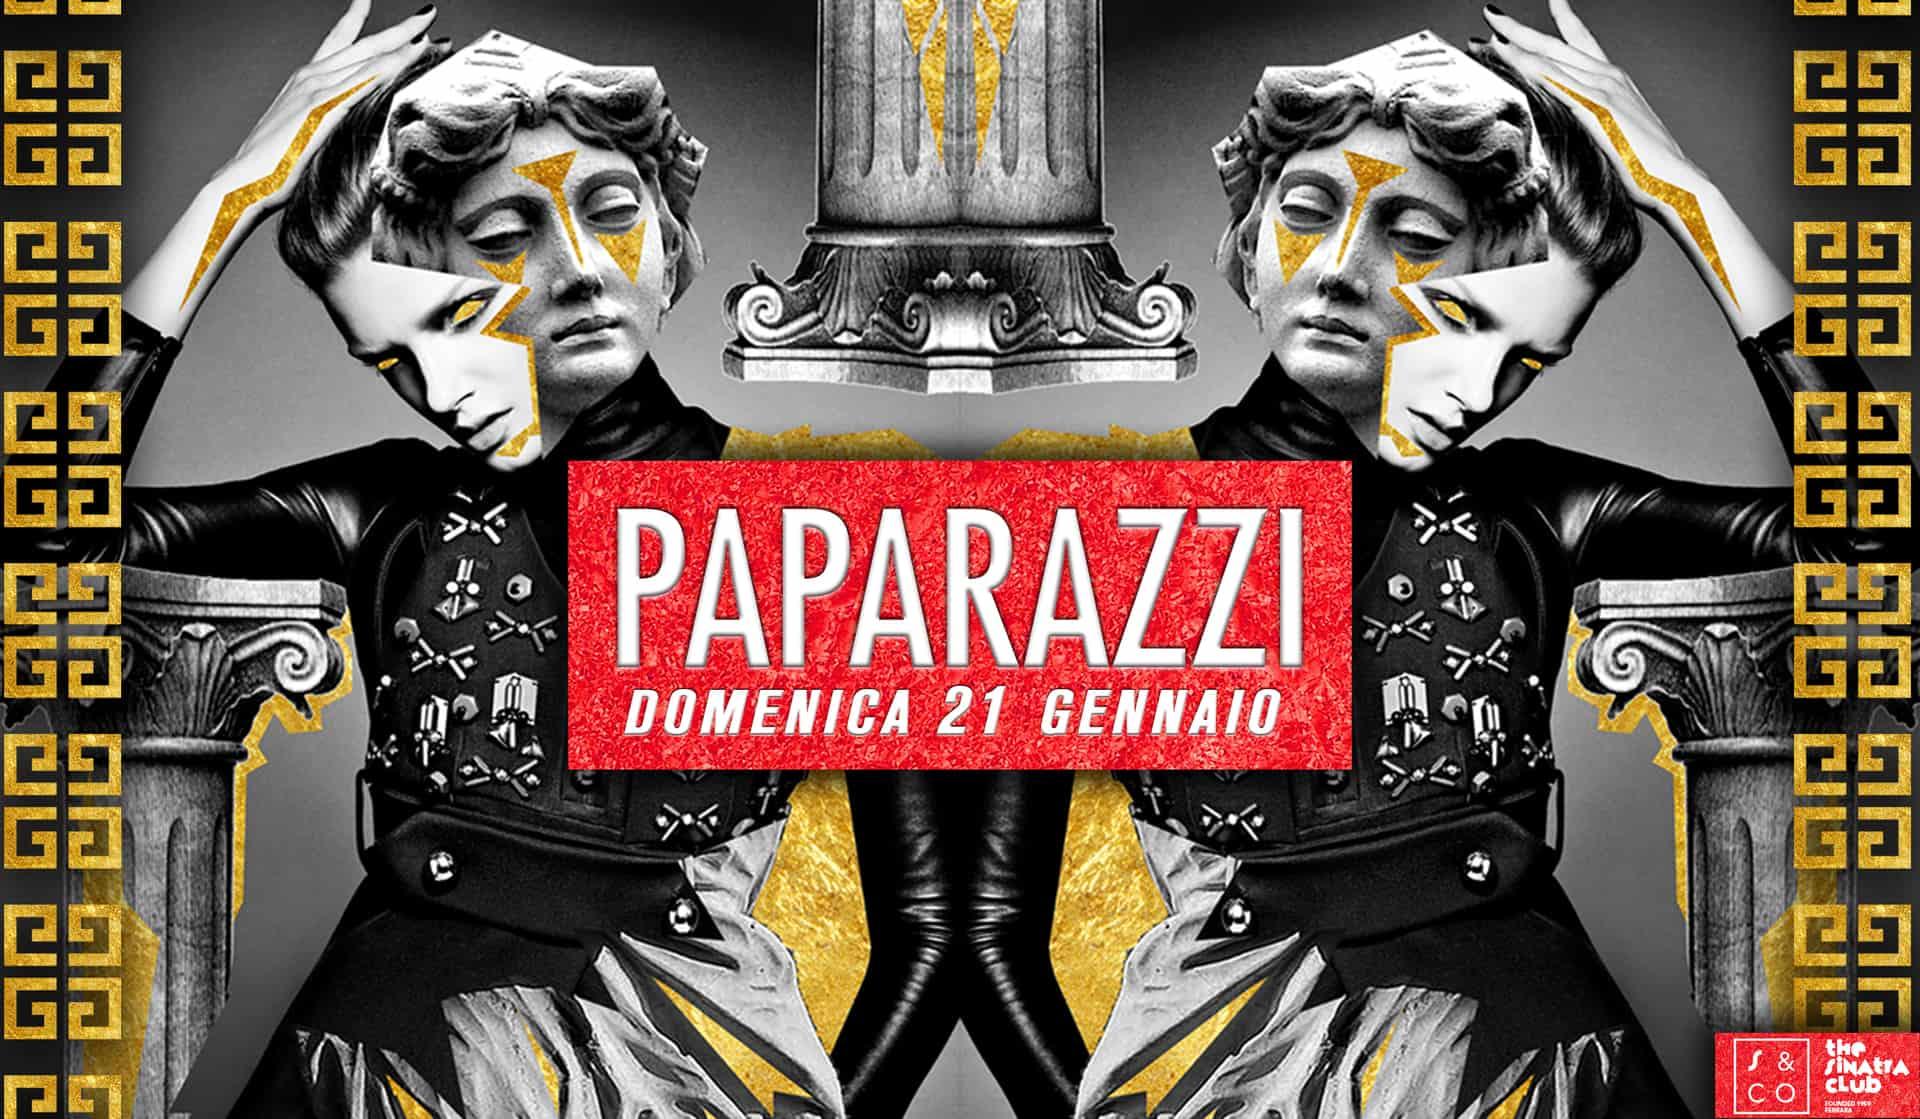 EVENTO_21_GENNAIO_aperitivo_paparazzi_sinatra_club_ferrara